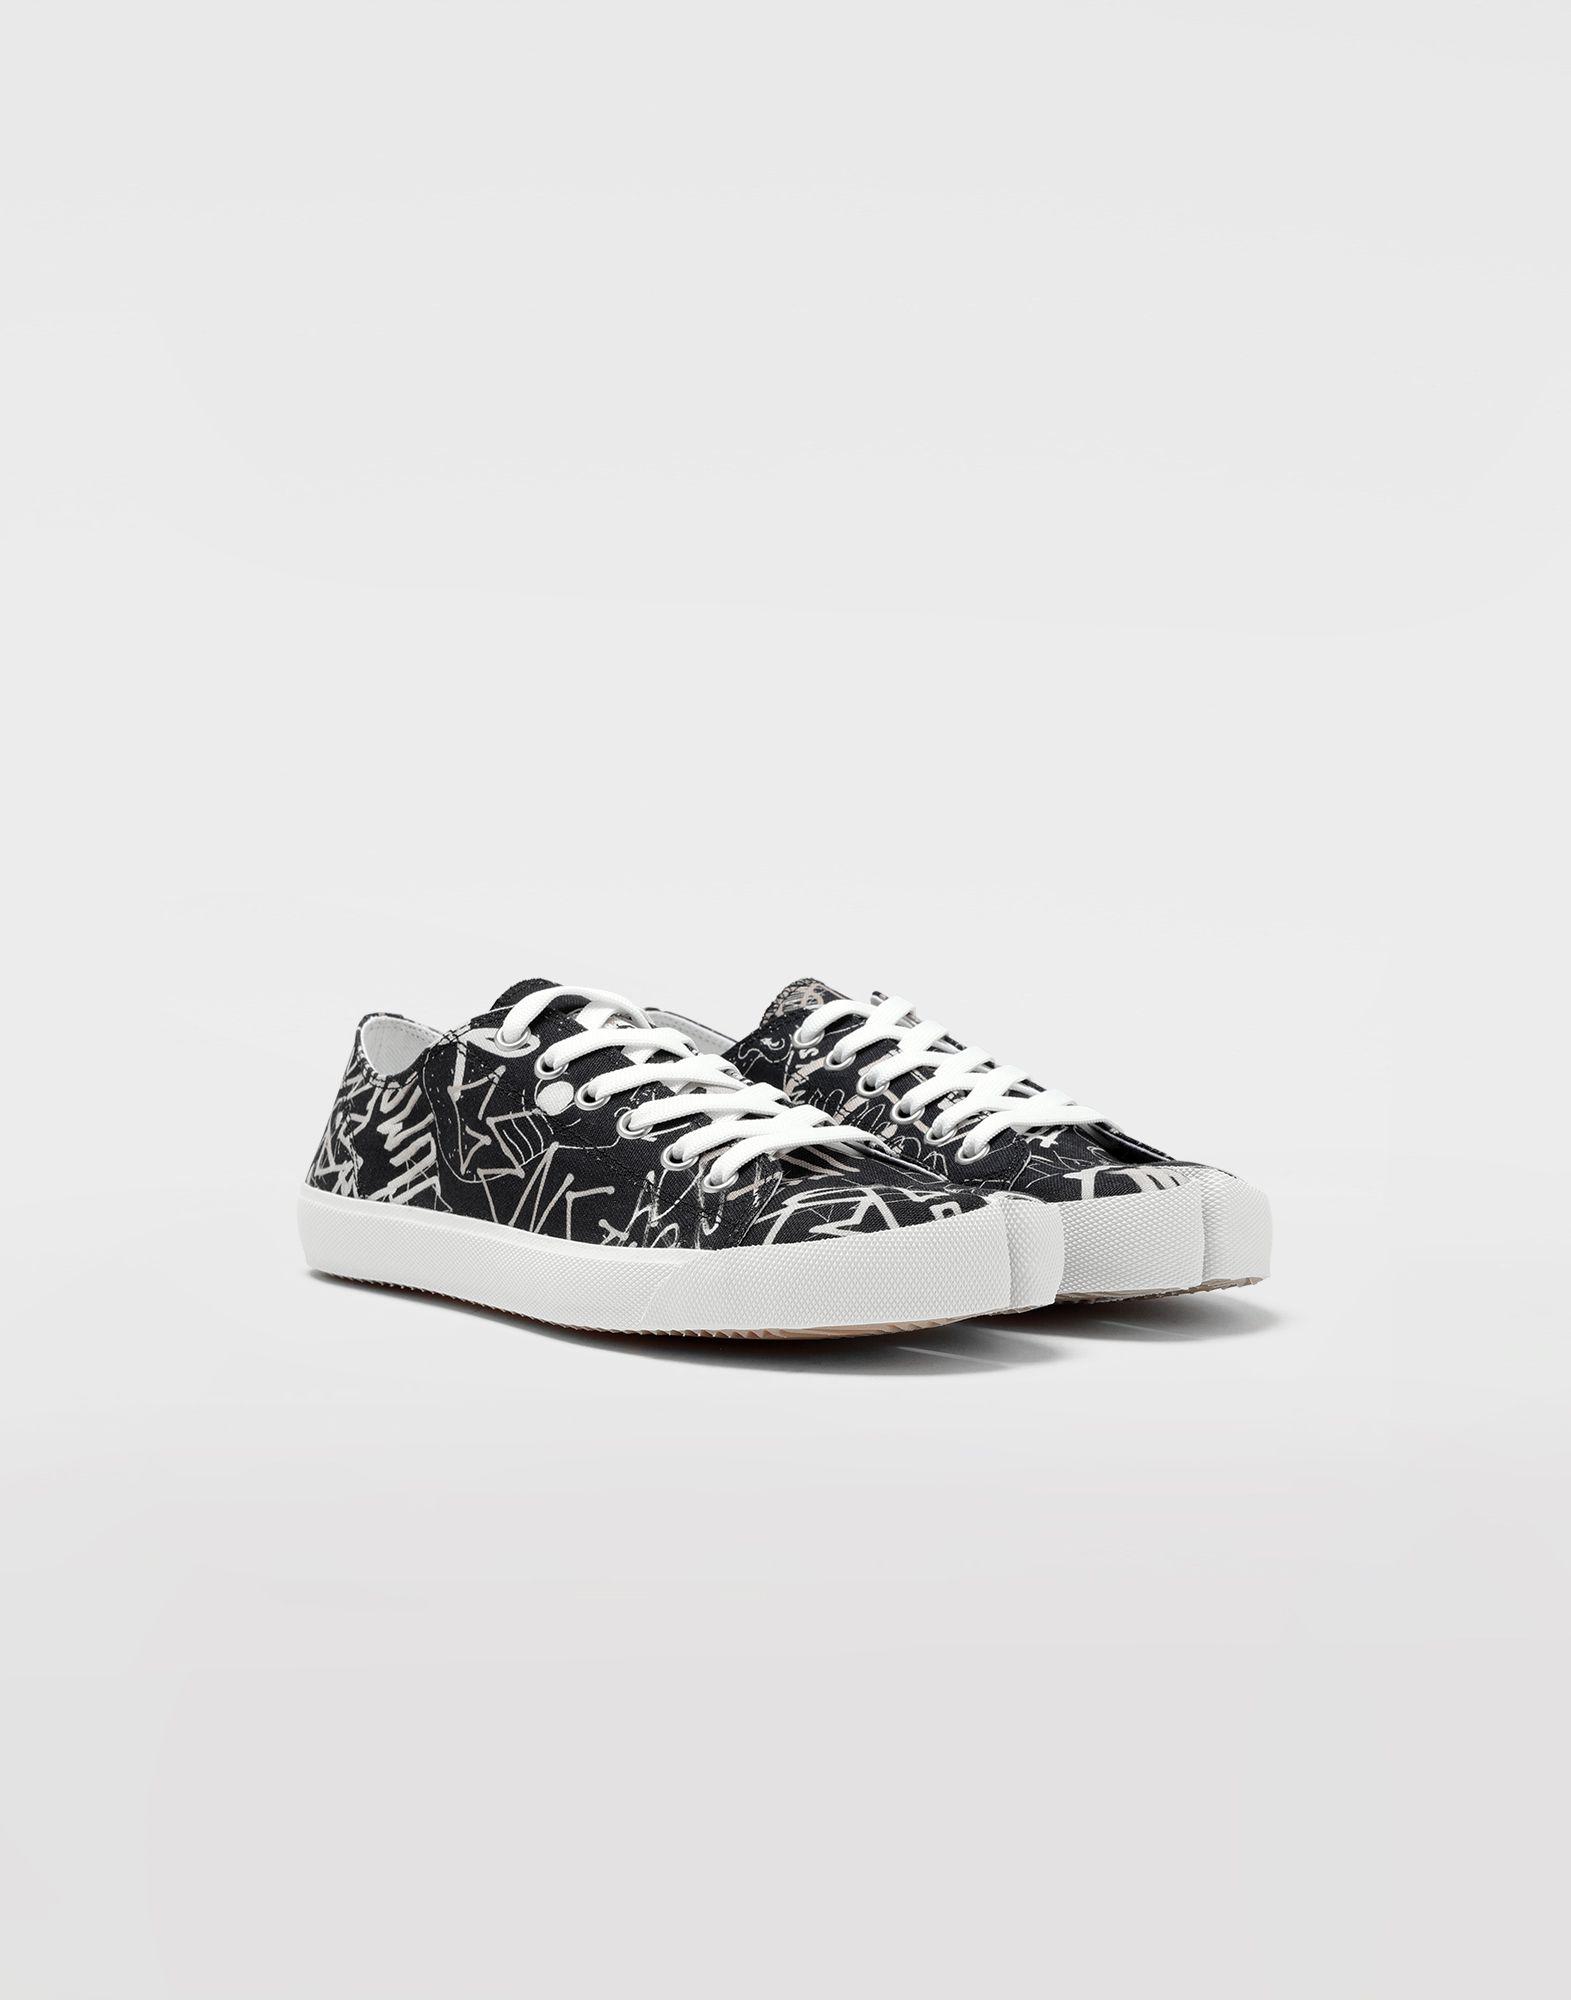 MAISON MARGIELA Graffiti Tabi sneakers Sneakers Man d